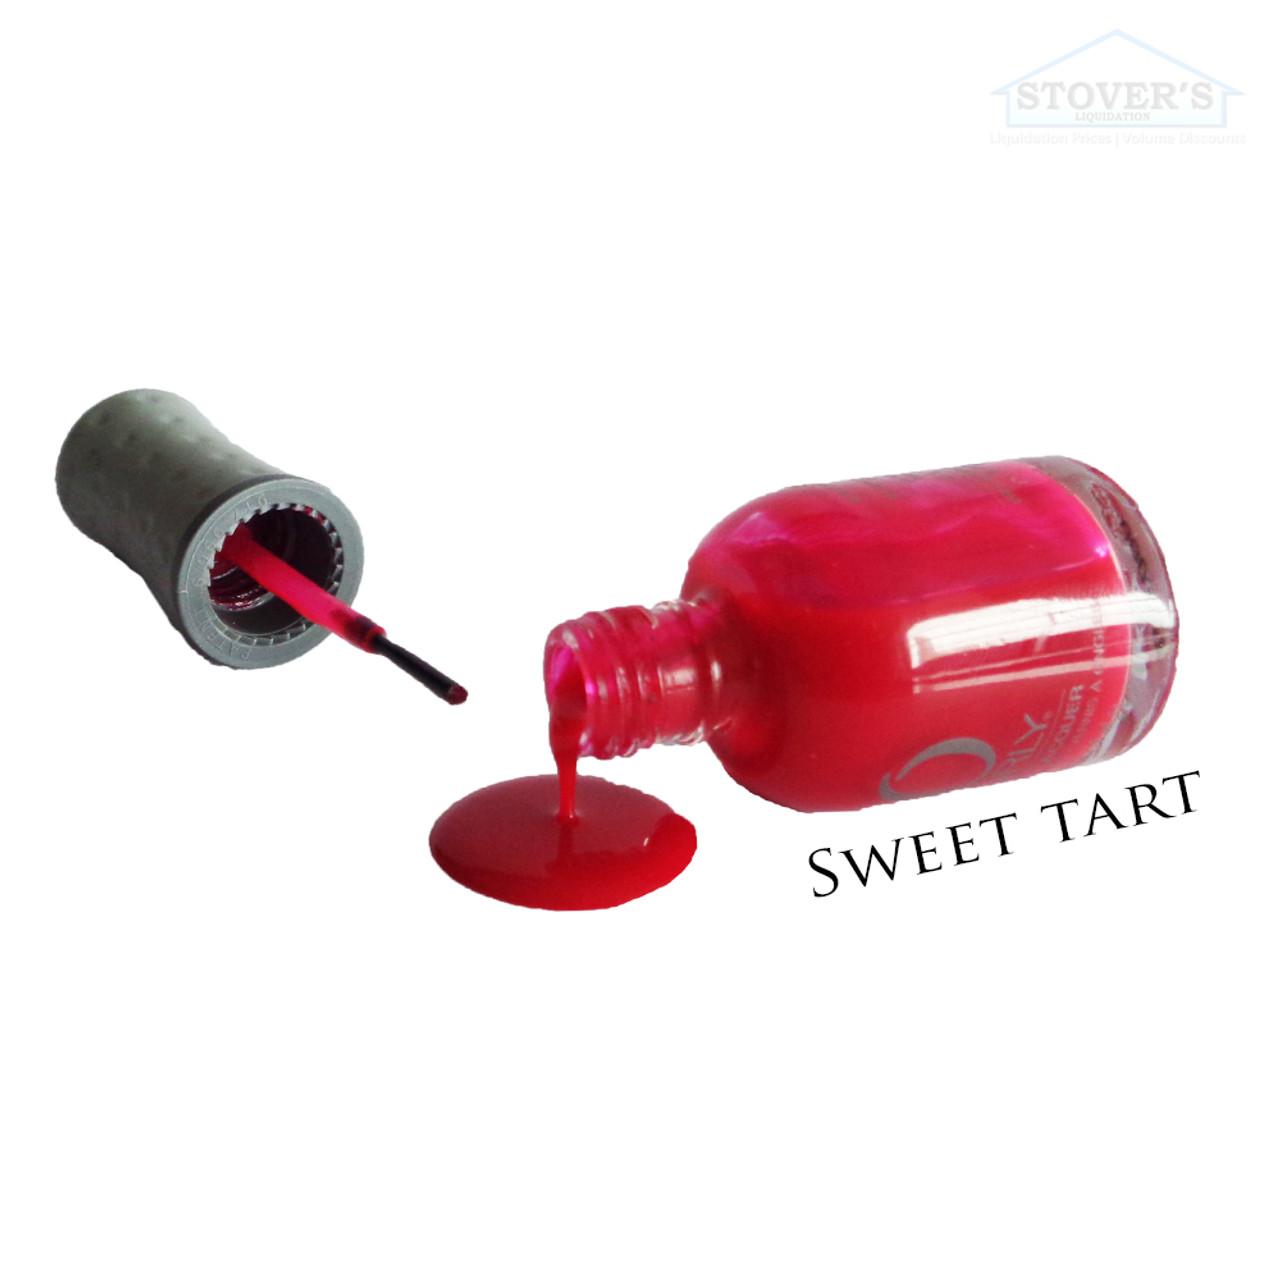 Orly, Loreal, & Confetti   Cosmetics   Nail Polish   3 pk